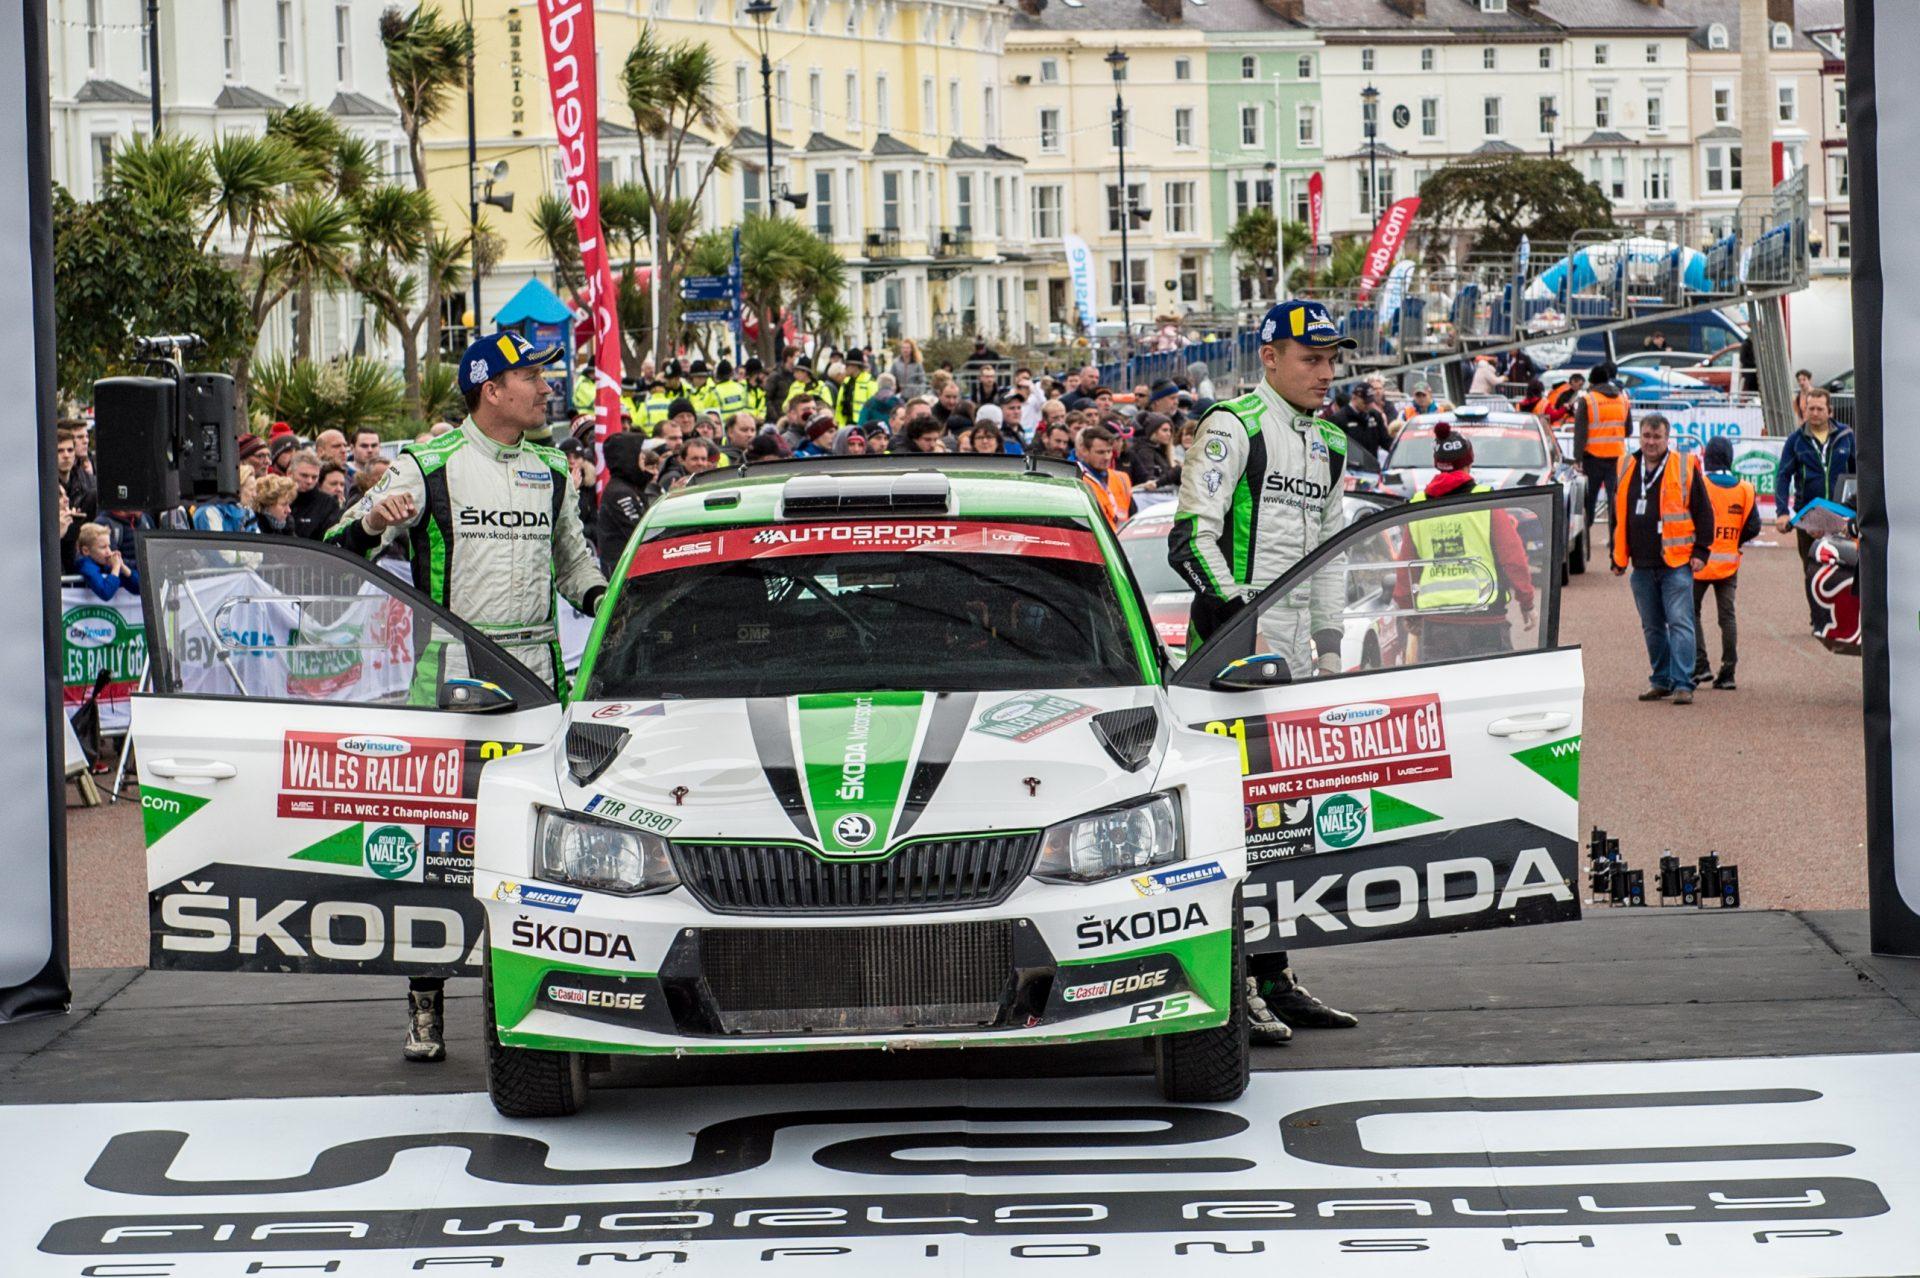 Wales Rally GB 2018: Novinky a výsledky [aktualizováno]